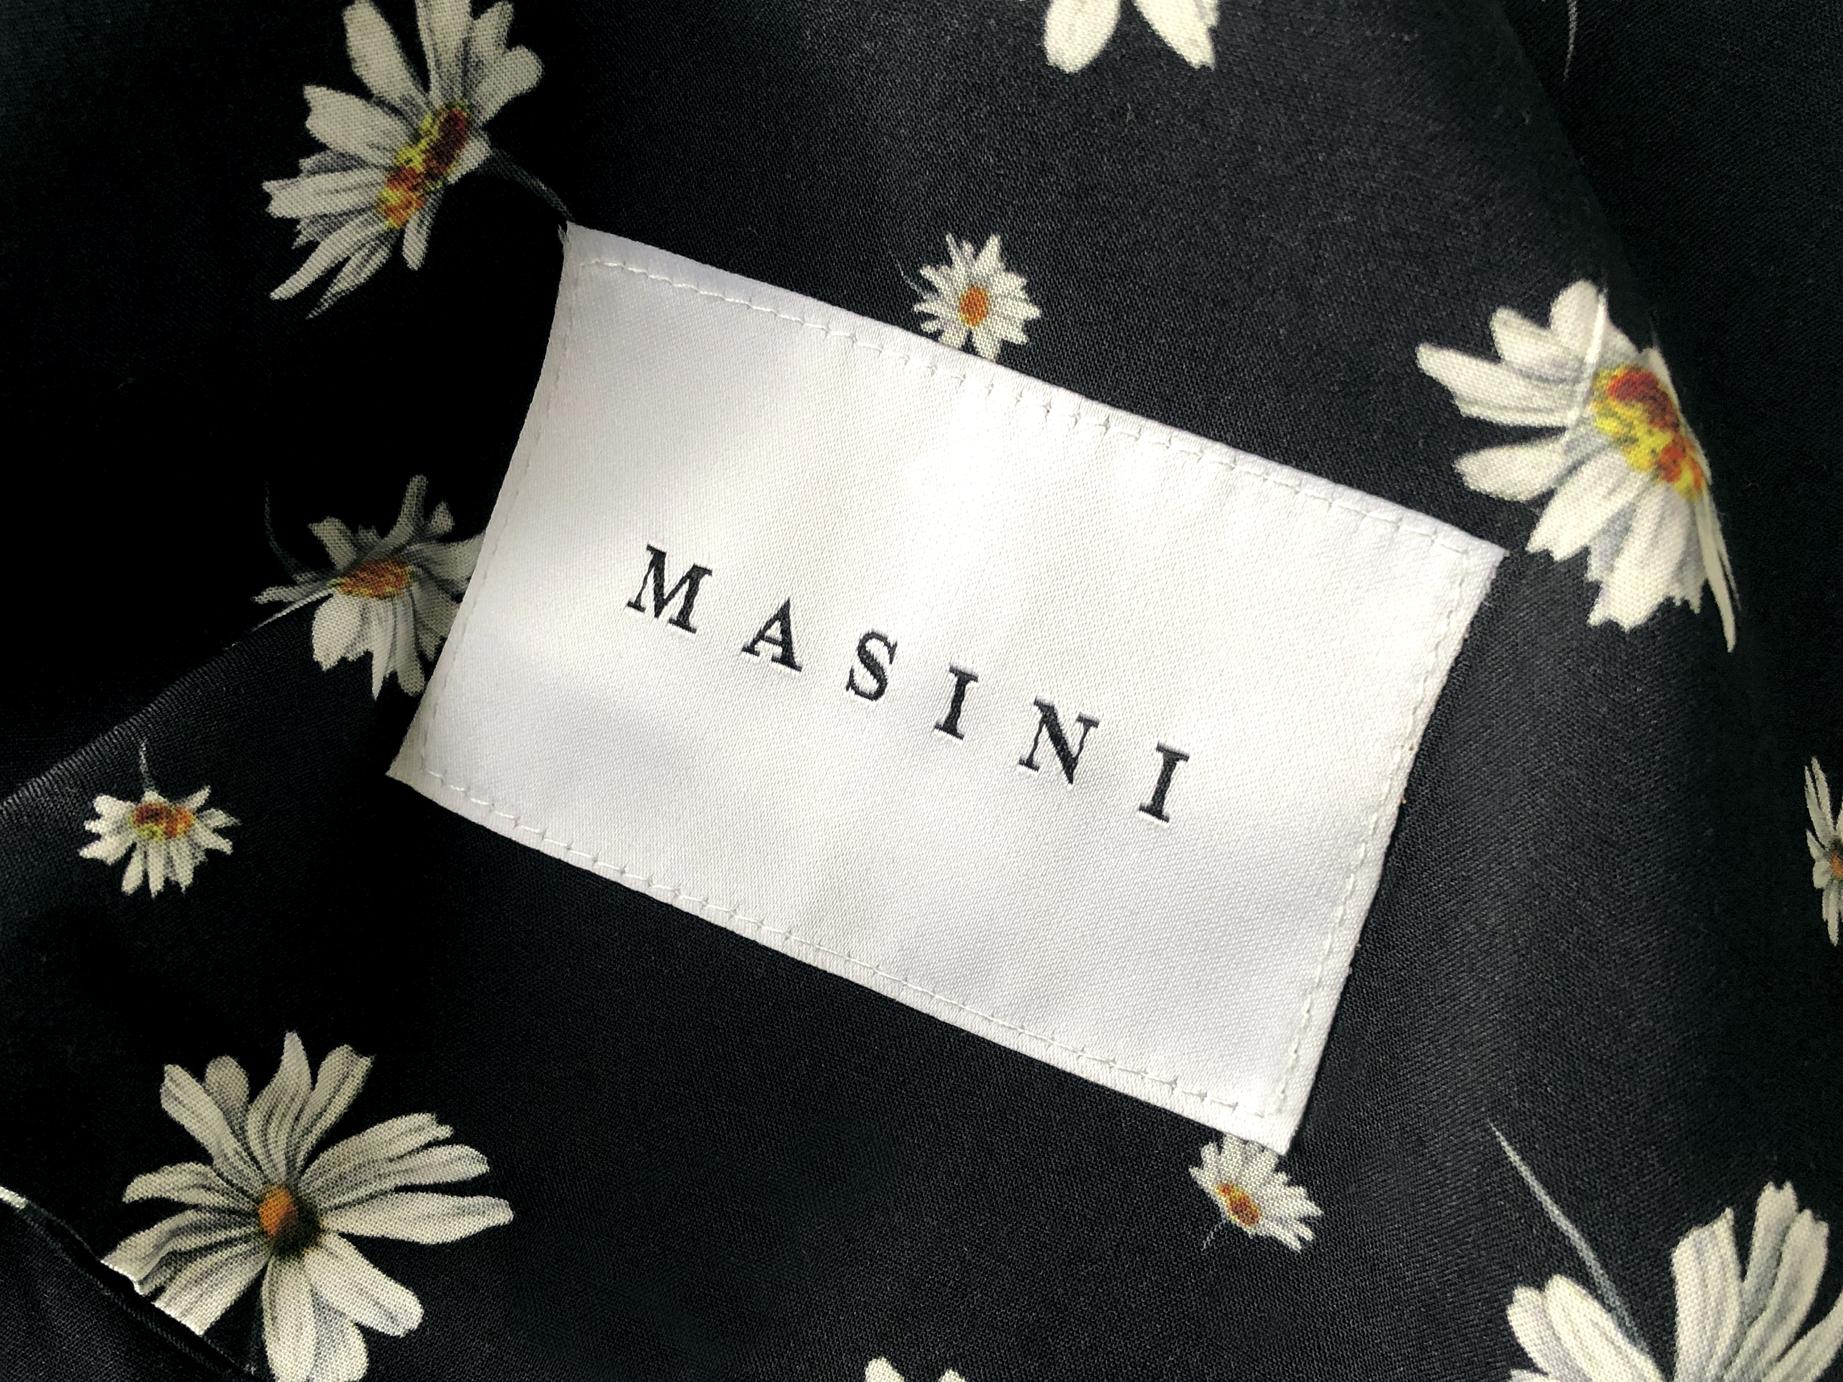 Masini-logo-web-2.jpg